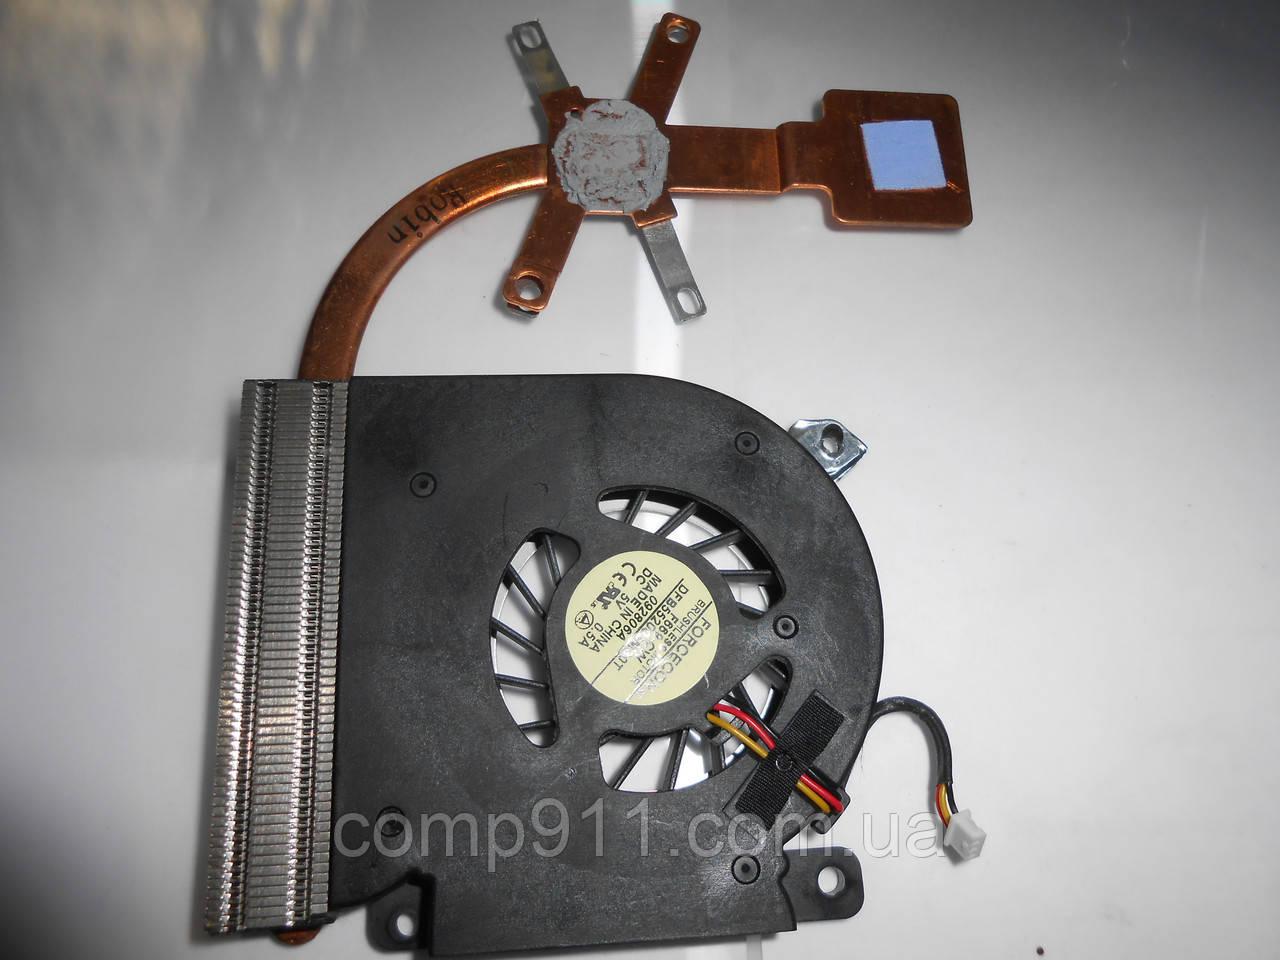 Система охолодження для ноутбука Acer TravelMate 2490